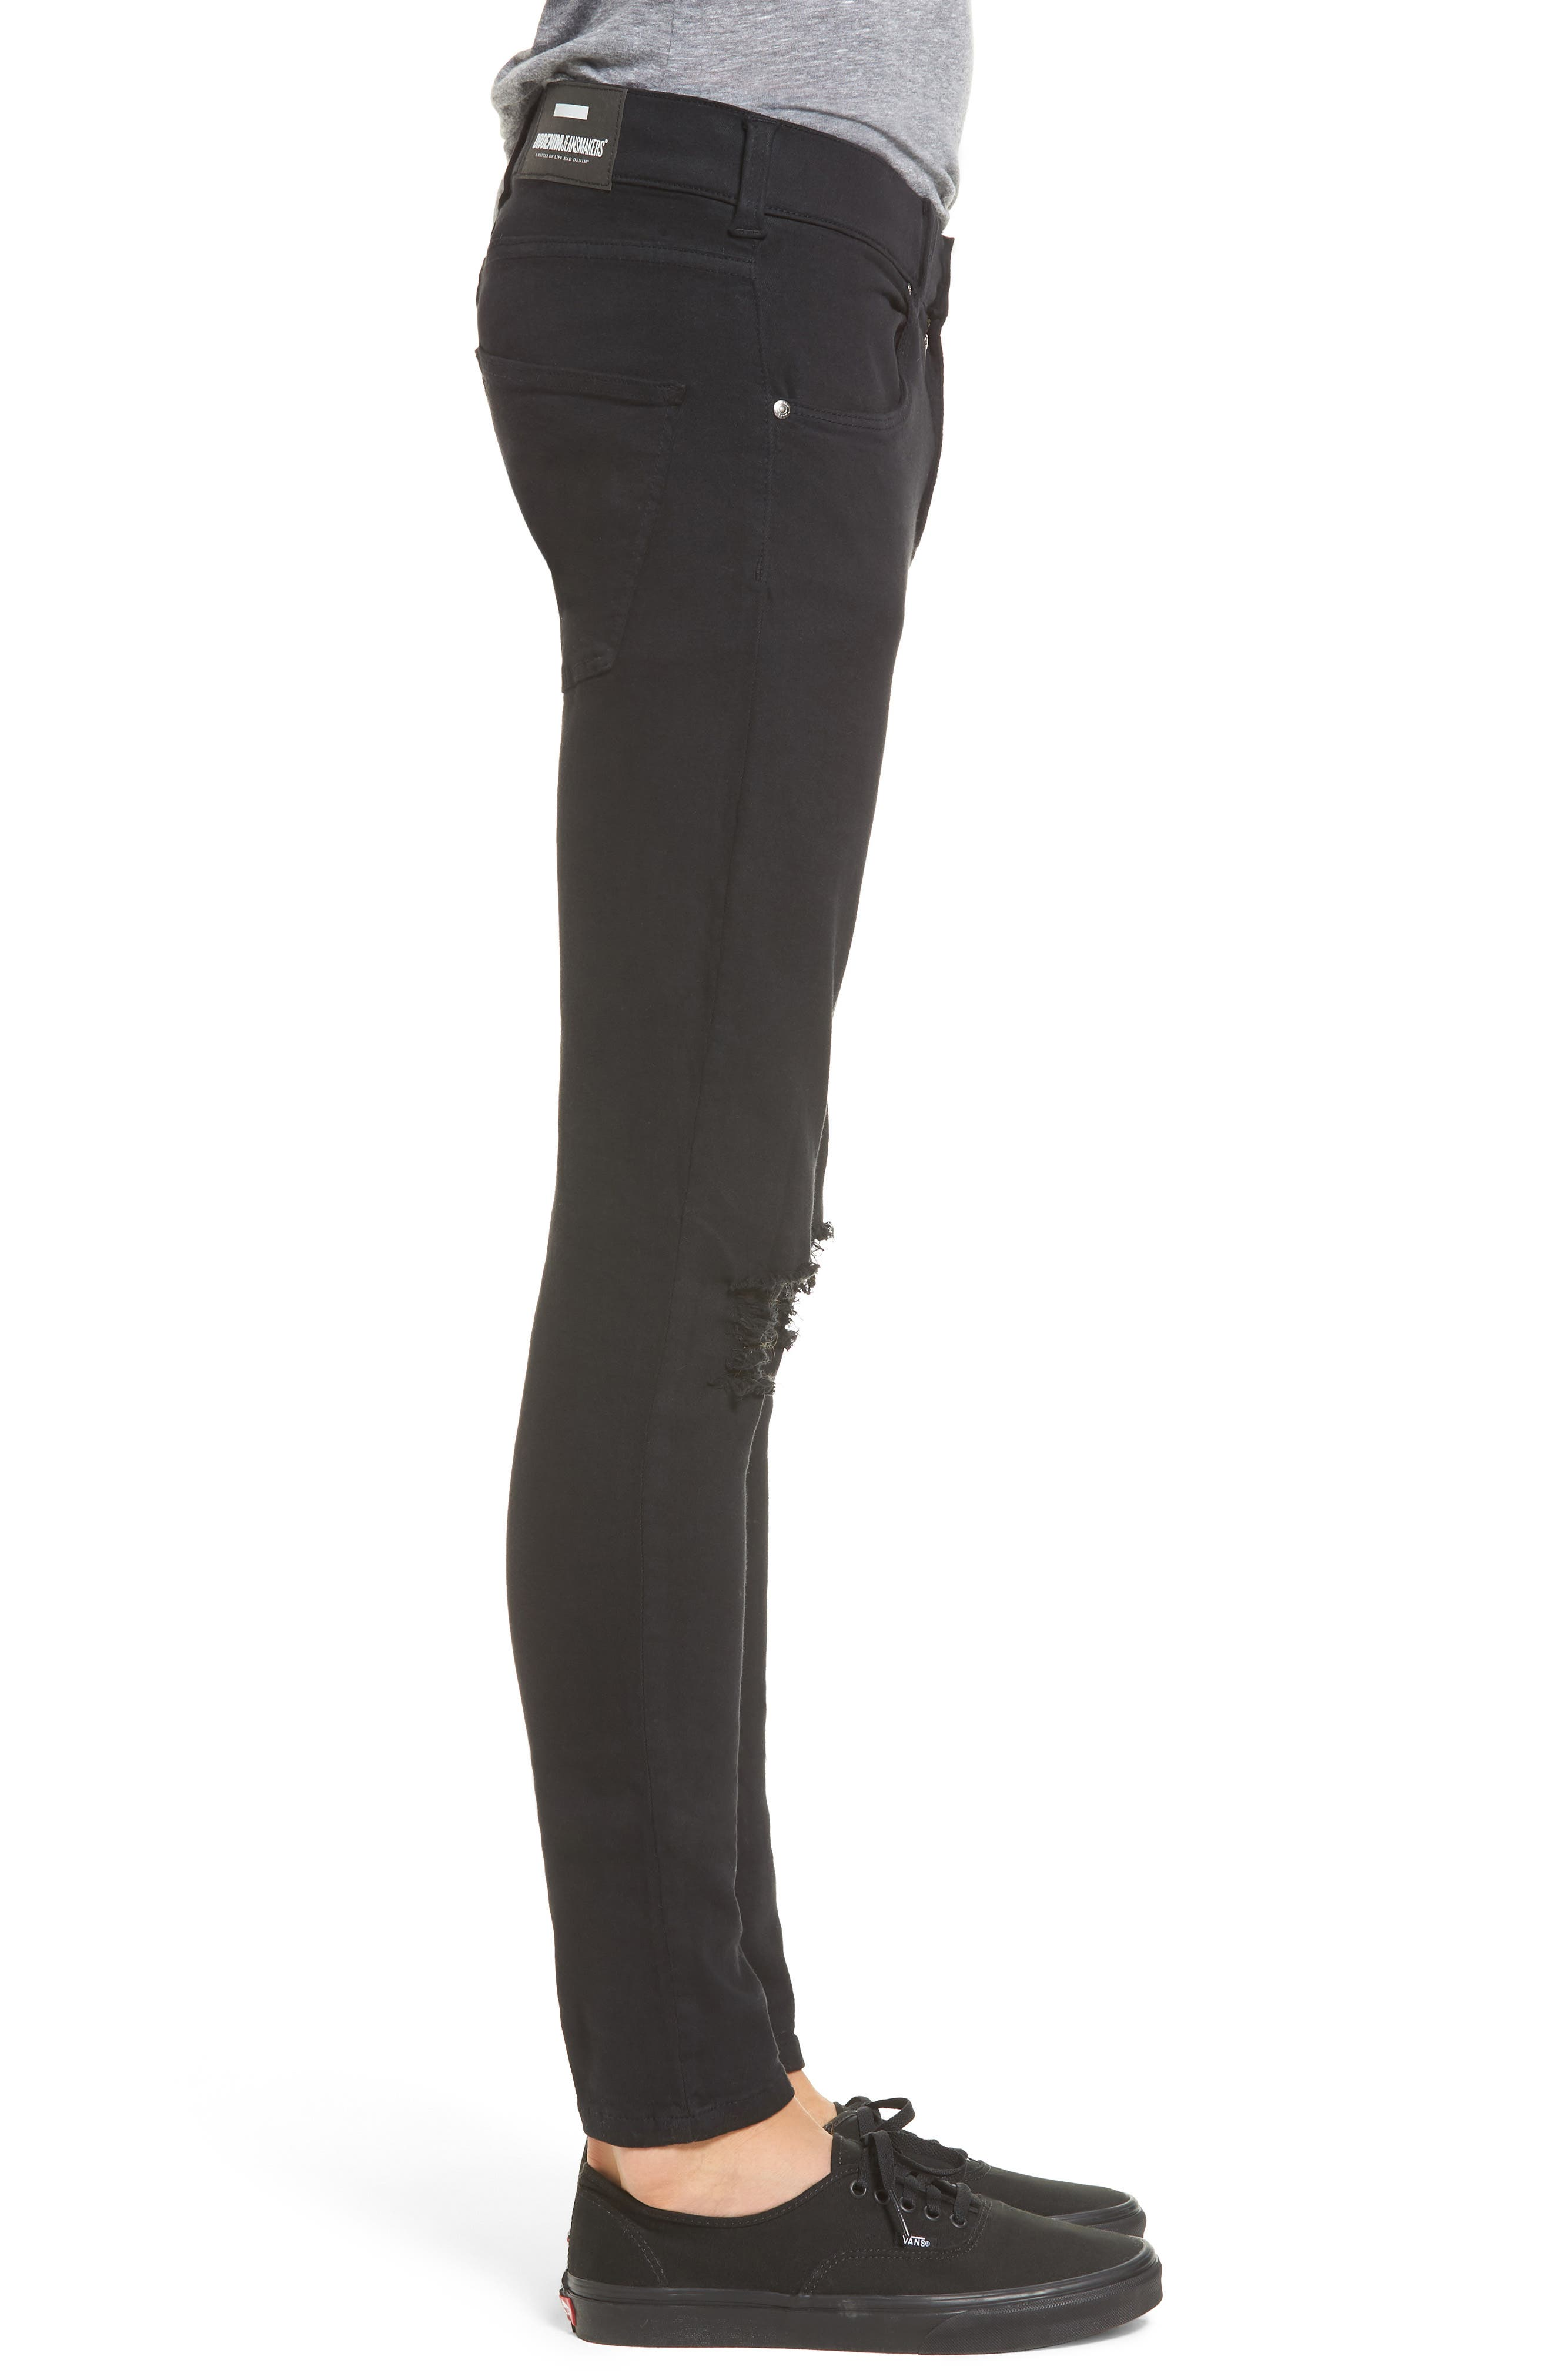 Leroy Slim Fit Jeans,                             Alternate thumbnail 3, color,                             Black Ripped Knees